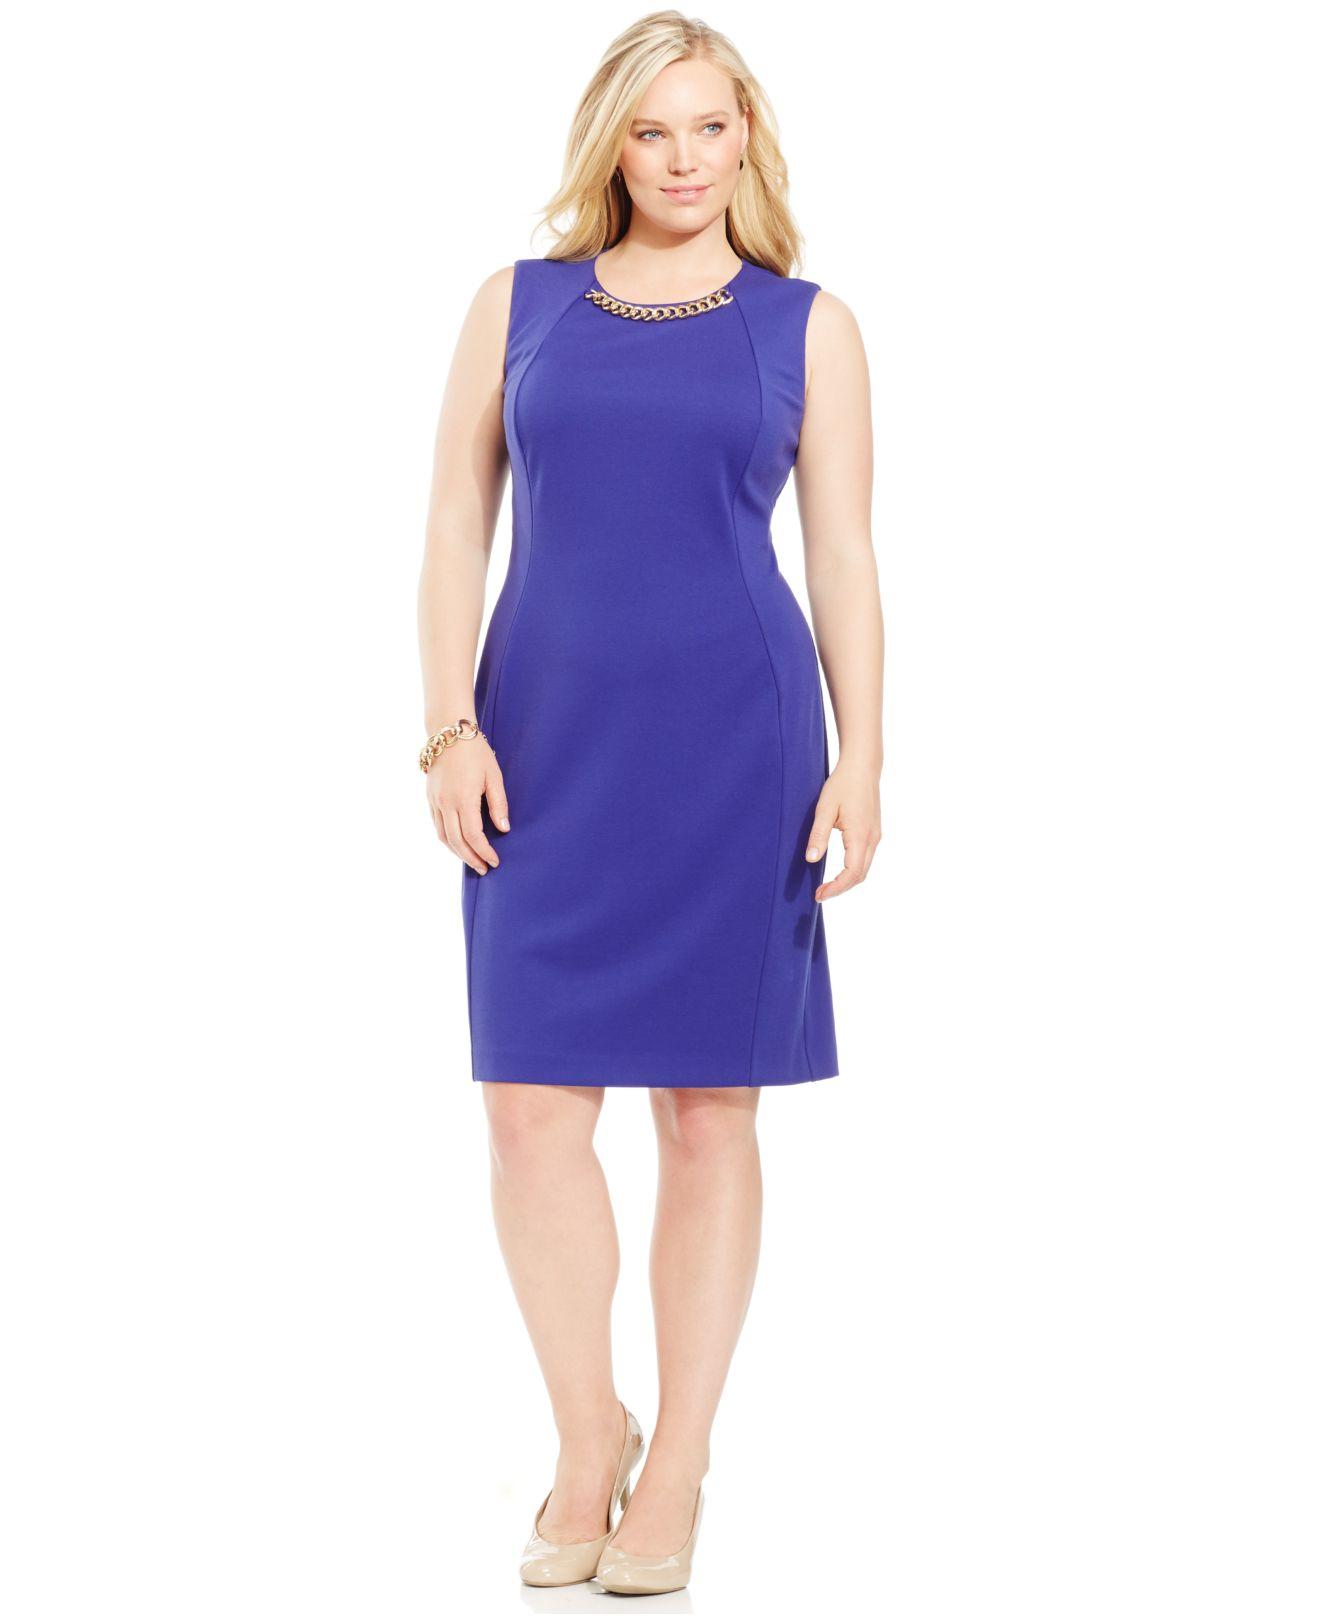 714dd81c946 Lyst - Calvin Klein Plus Size Chain-link Sheath Dress in Blue